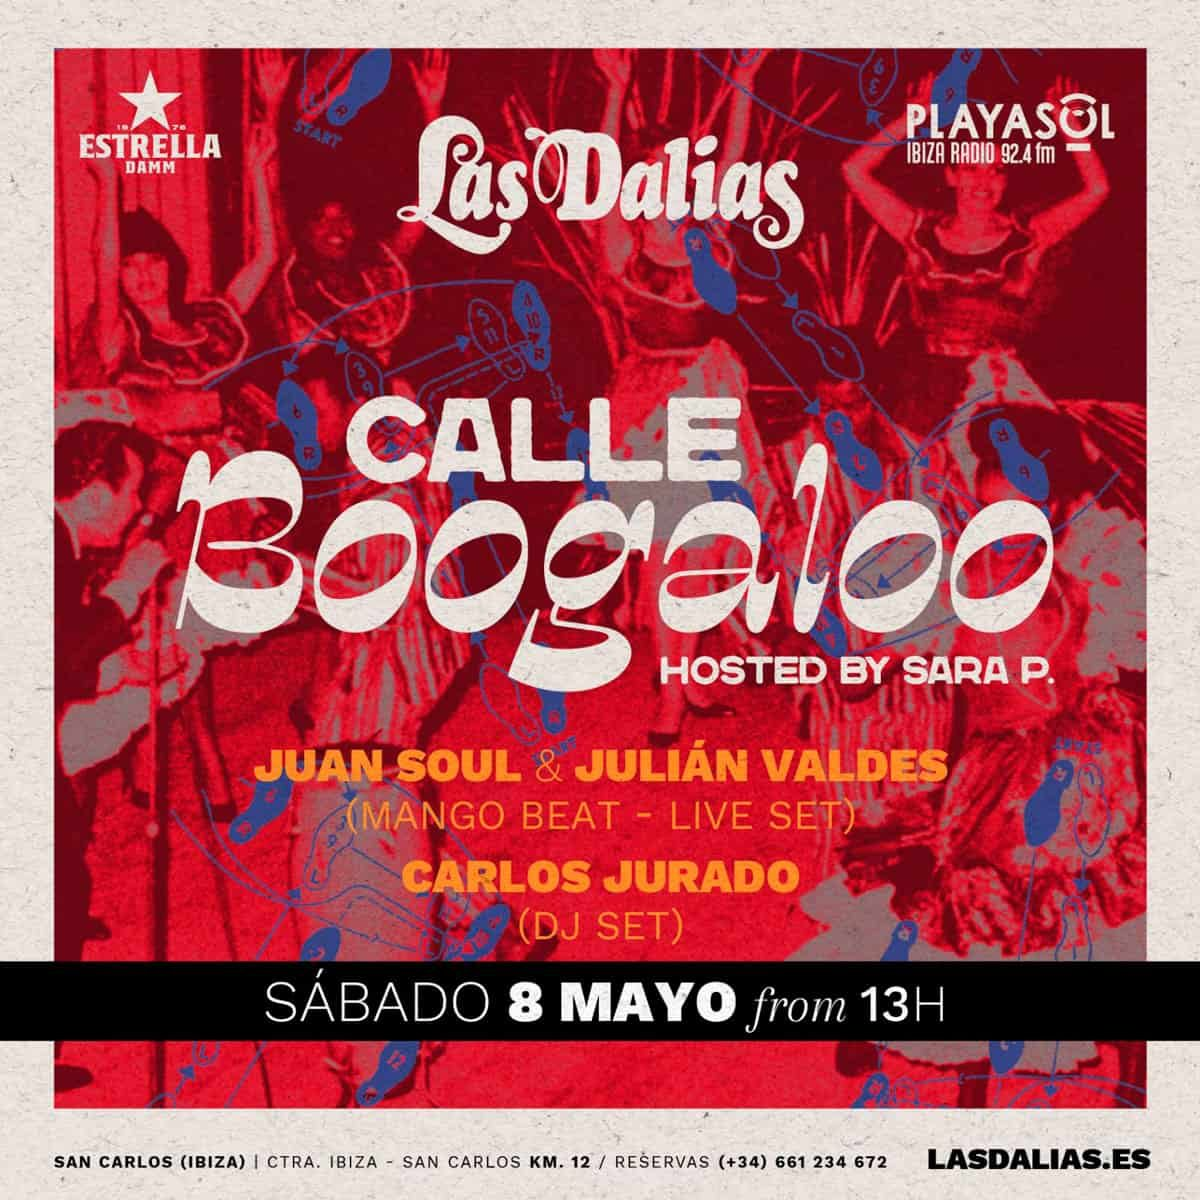 las-dalias-ibiza-calle-boogaloo-2021-welcometoibiza